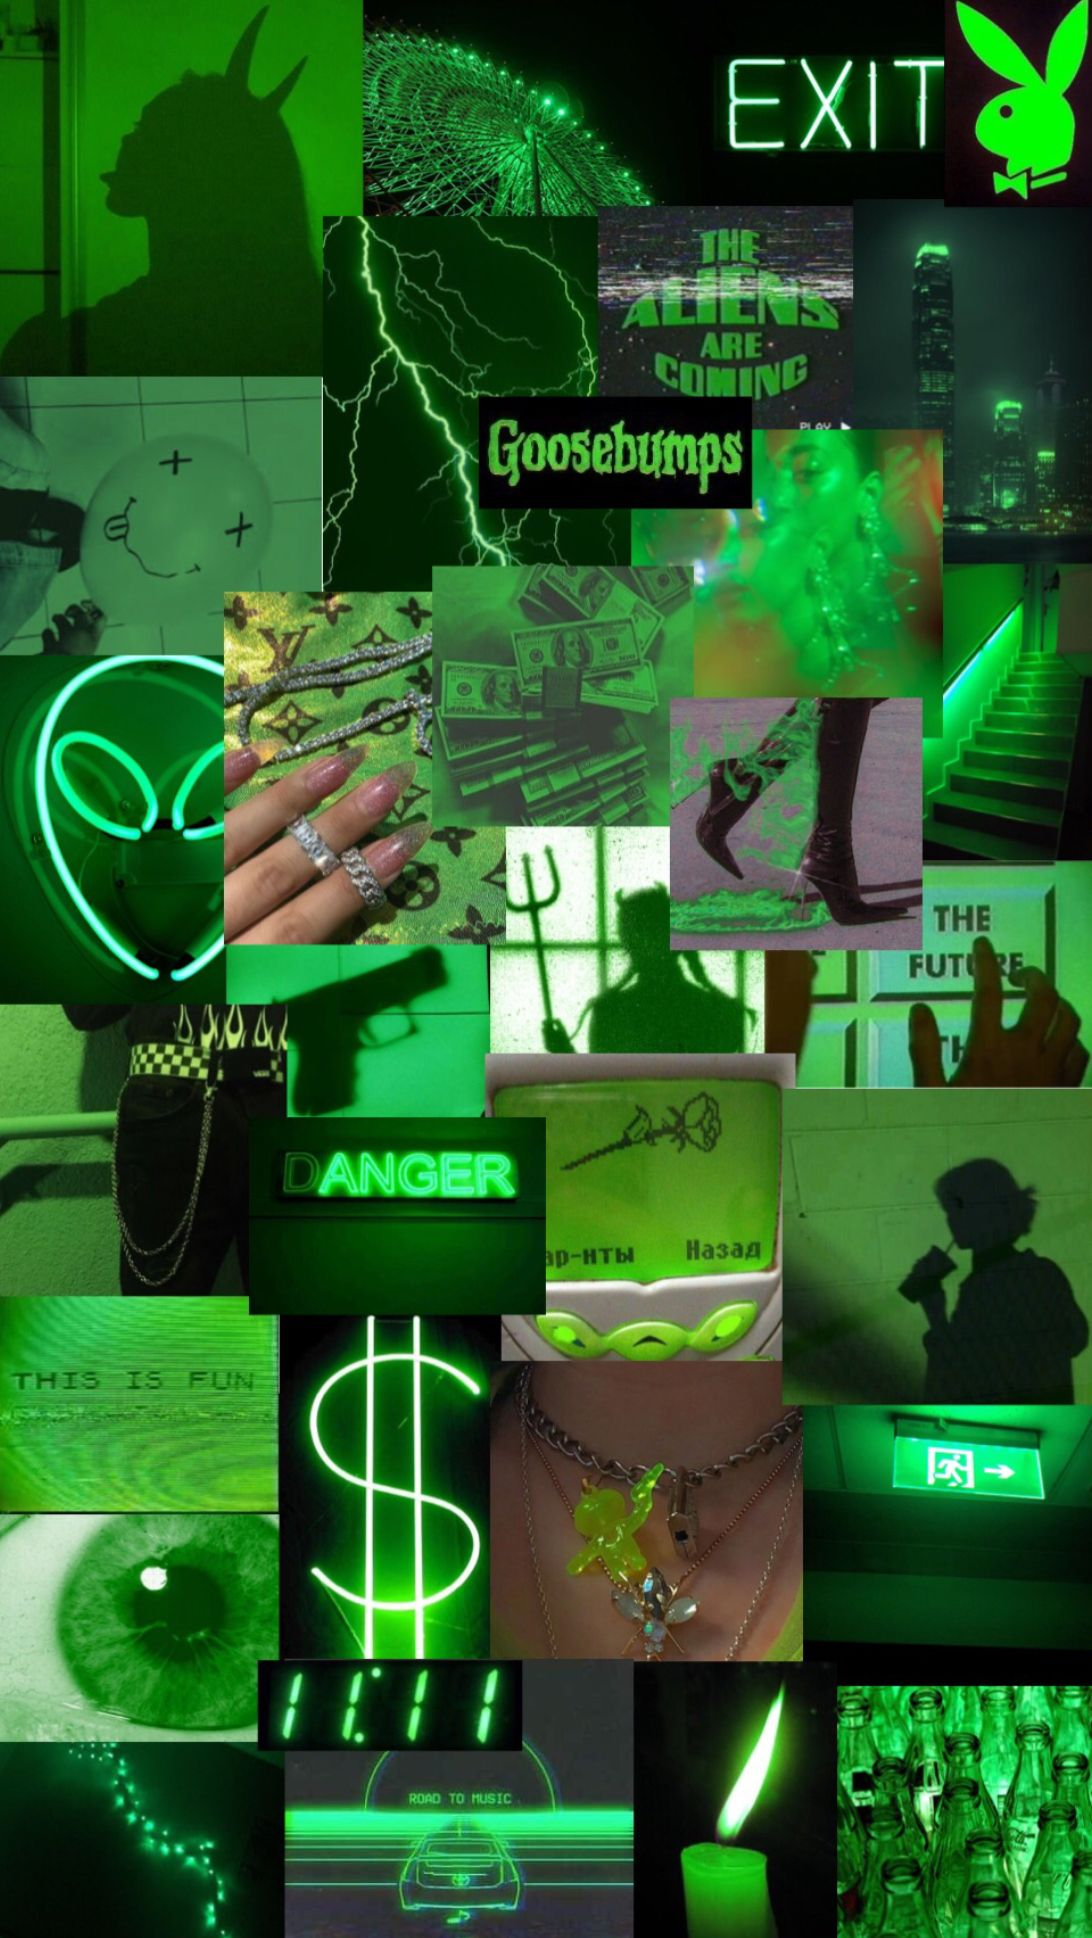 Green Aesthetic Collage Dark Wallpaper Iphone Iphone Wallpaper Tumblr Aesthetic Aesthetic Desktop Wallpaper